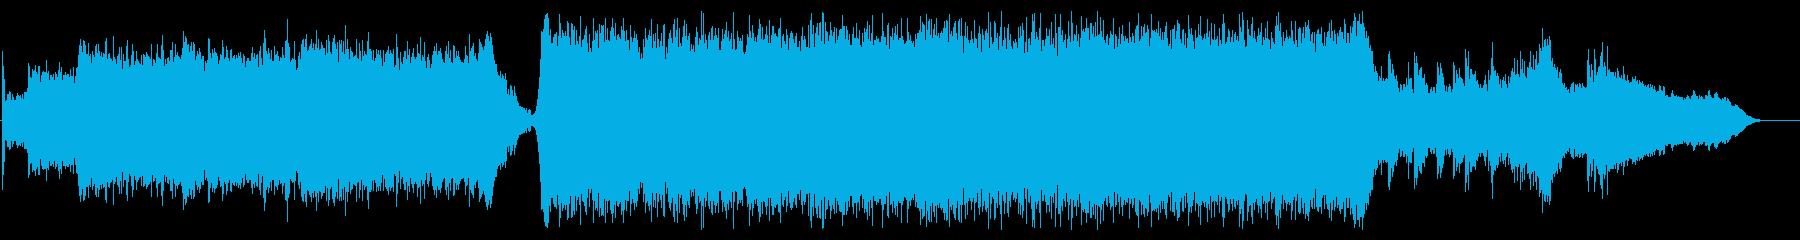 ★★★★EPIC TRAILER 001の再生済みの波形